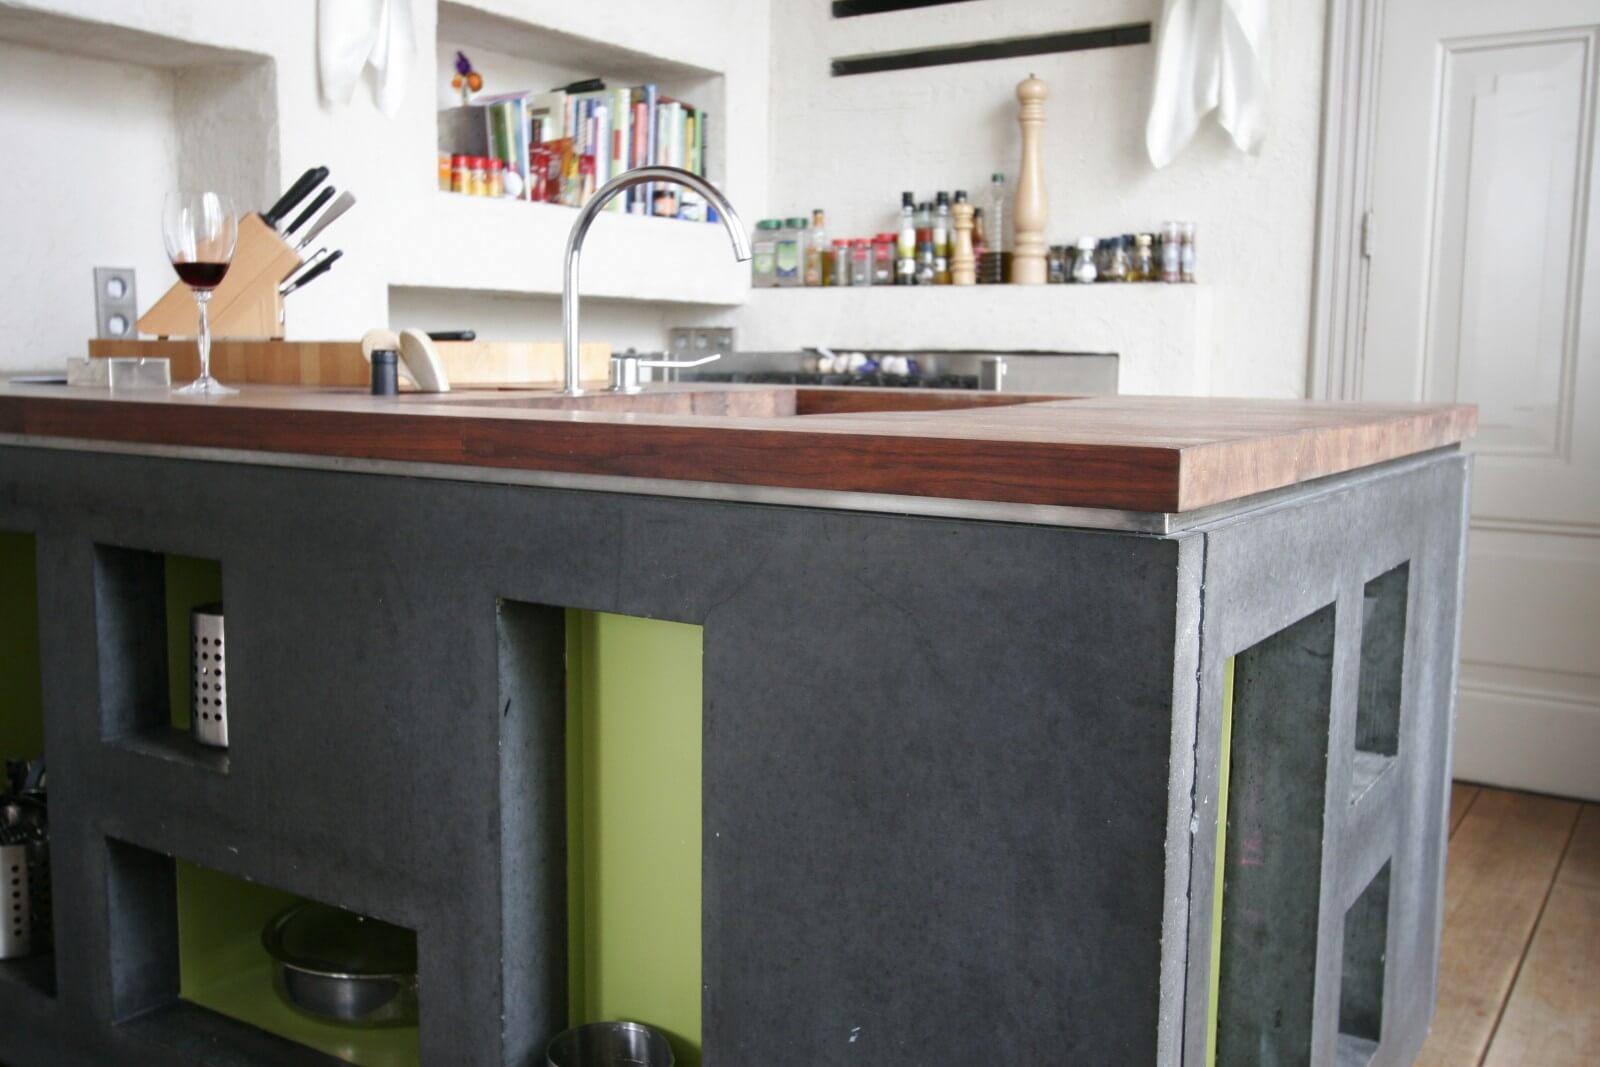 Beton In Keuken : Beton cire keuken beton cire